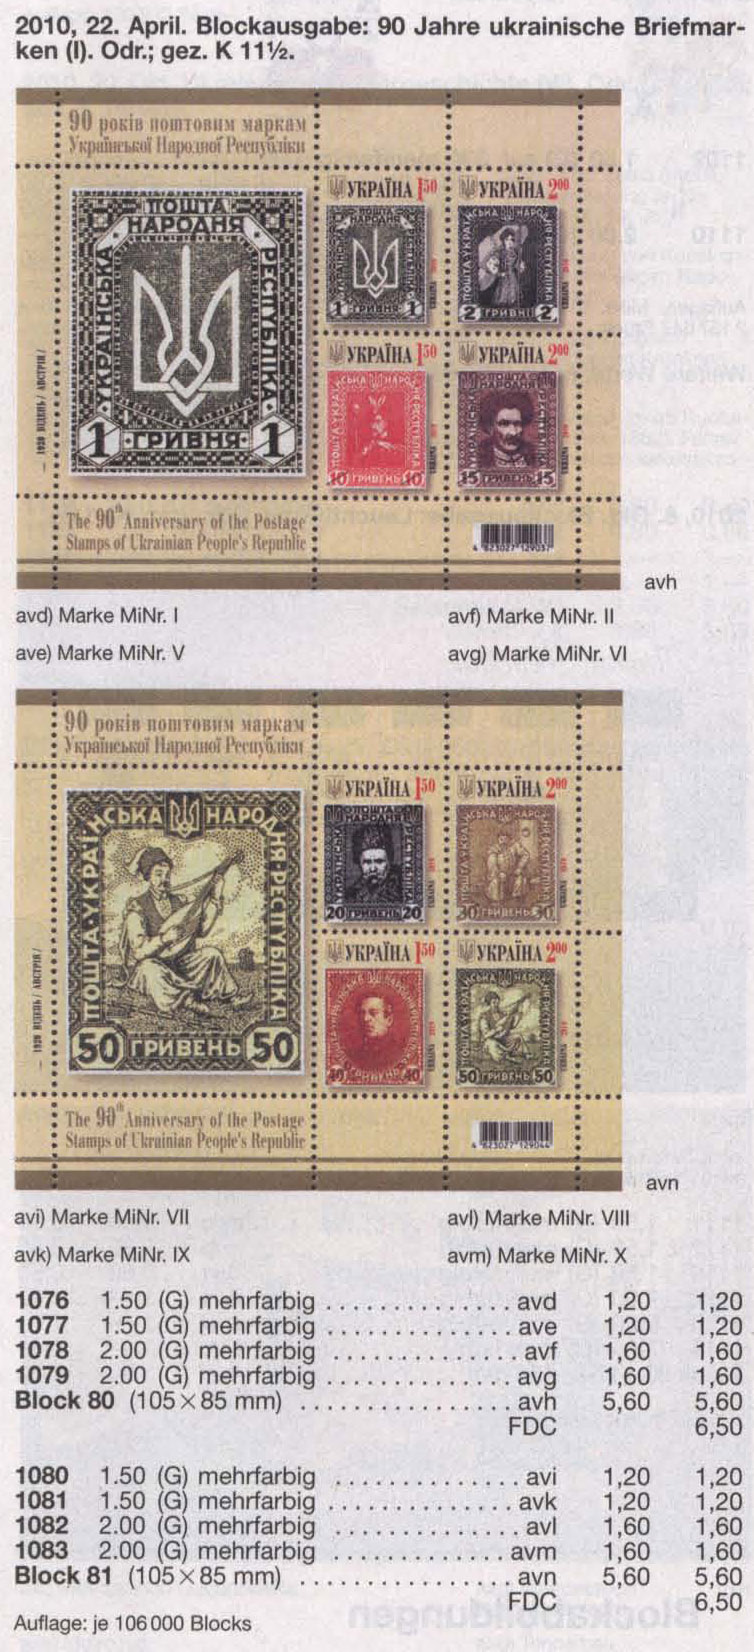 N1080-1083 (block81) каталог 2010 N1038-1041 (b84) блок 90-лет УНР казак Мамай